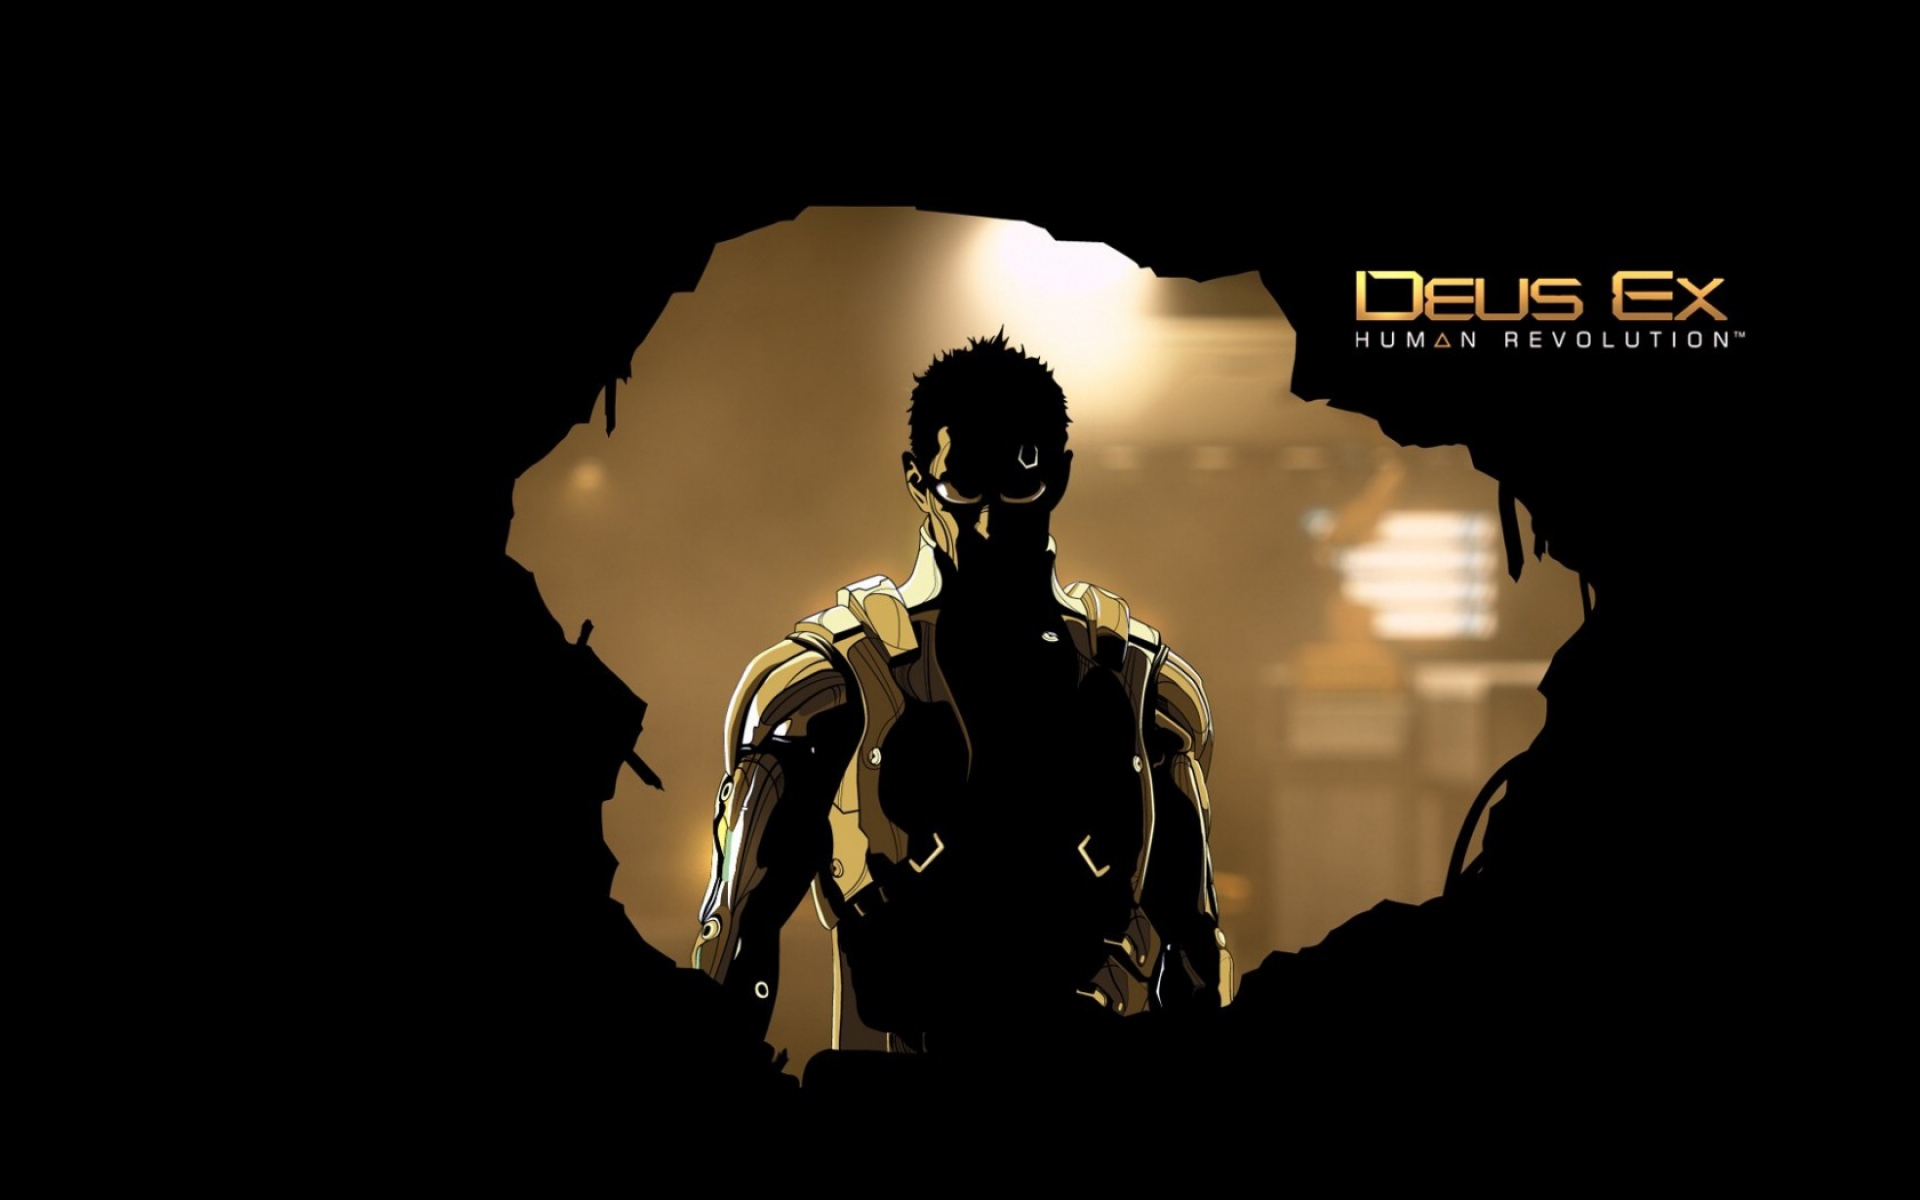 Картинки Deus ex human revolution, deus ex, cyborg, adam jensen, eidos interactive, square enix фото и обои на рабочий стол